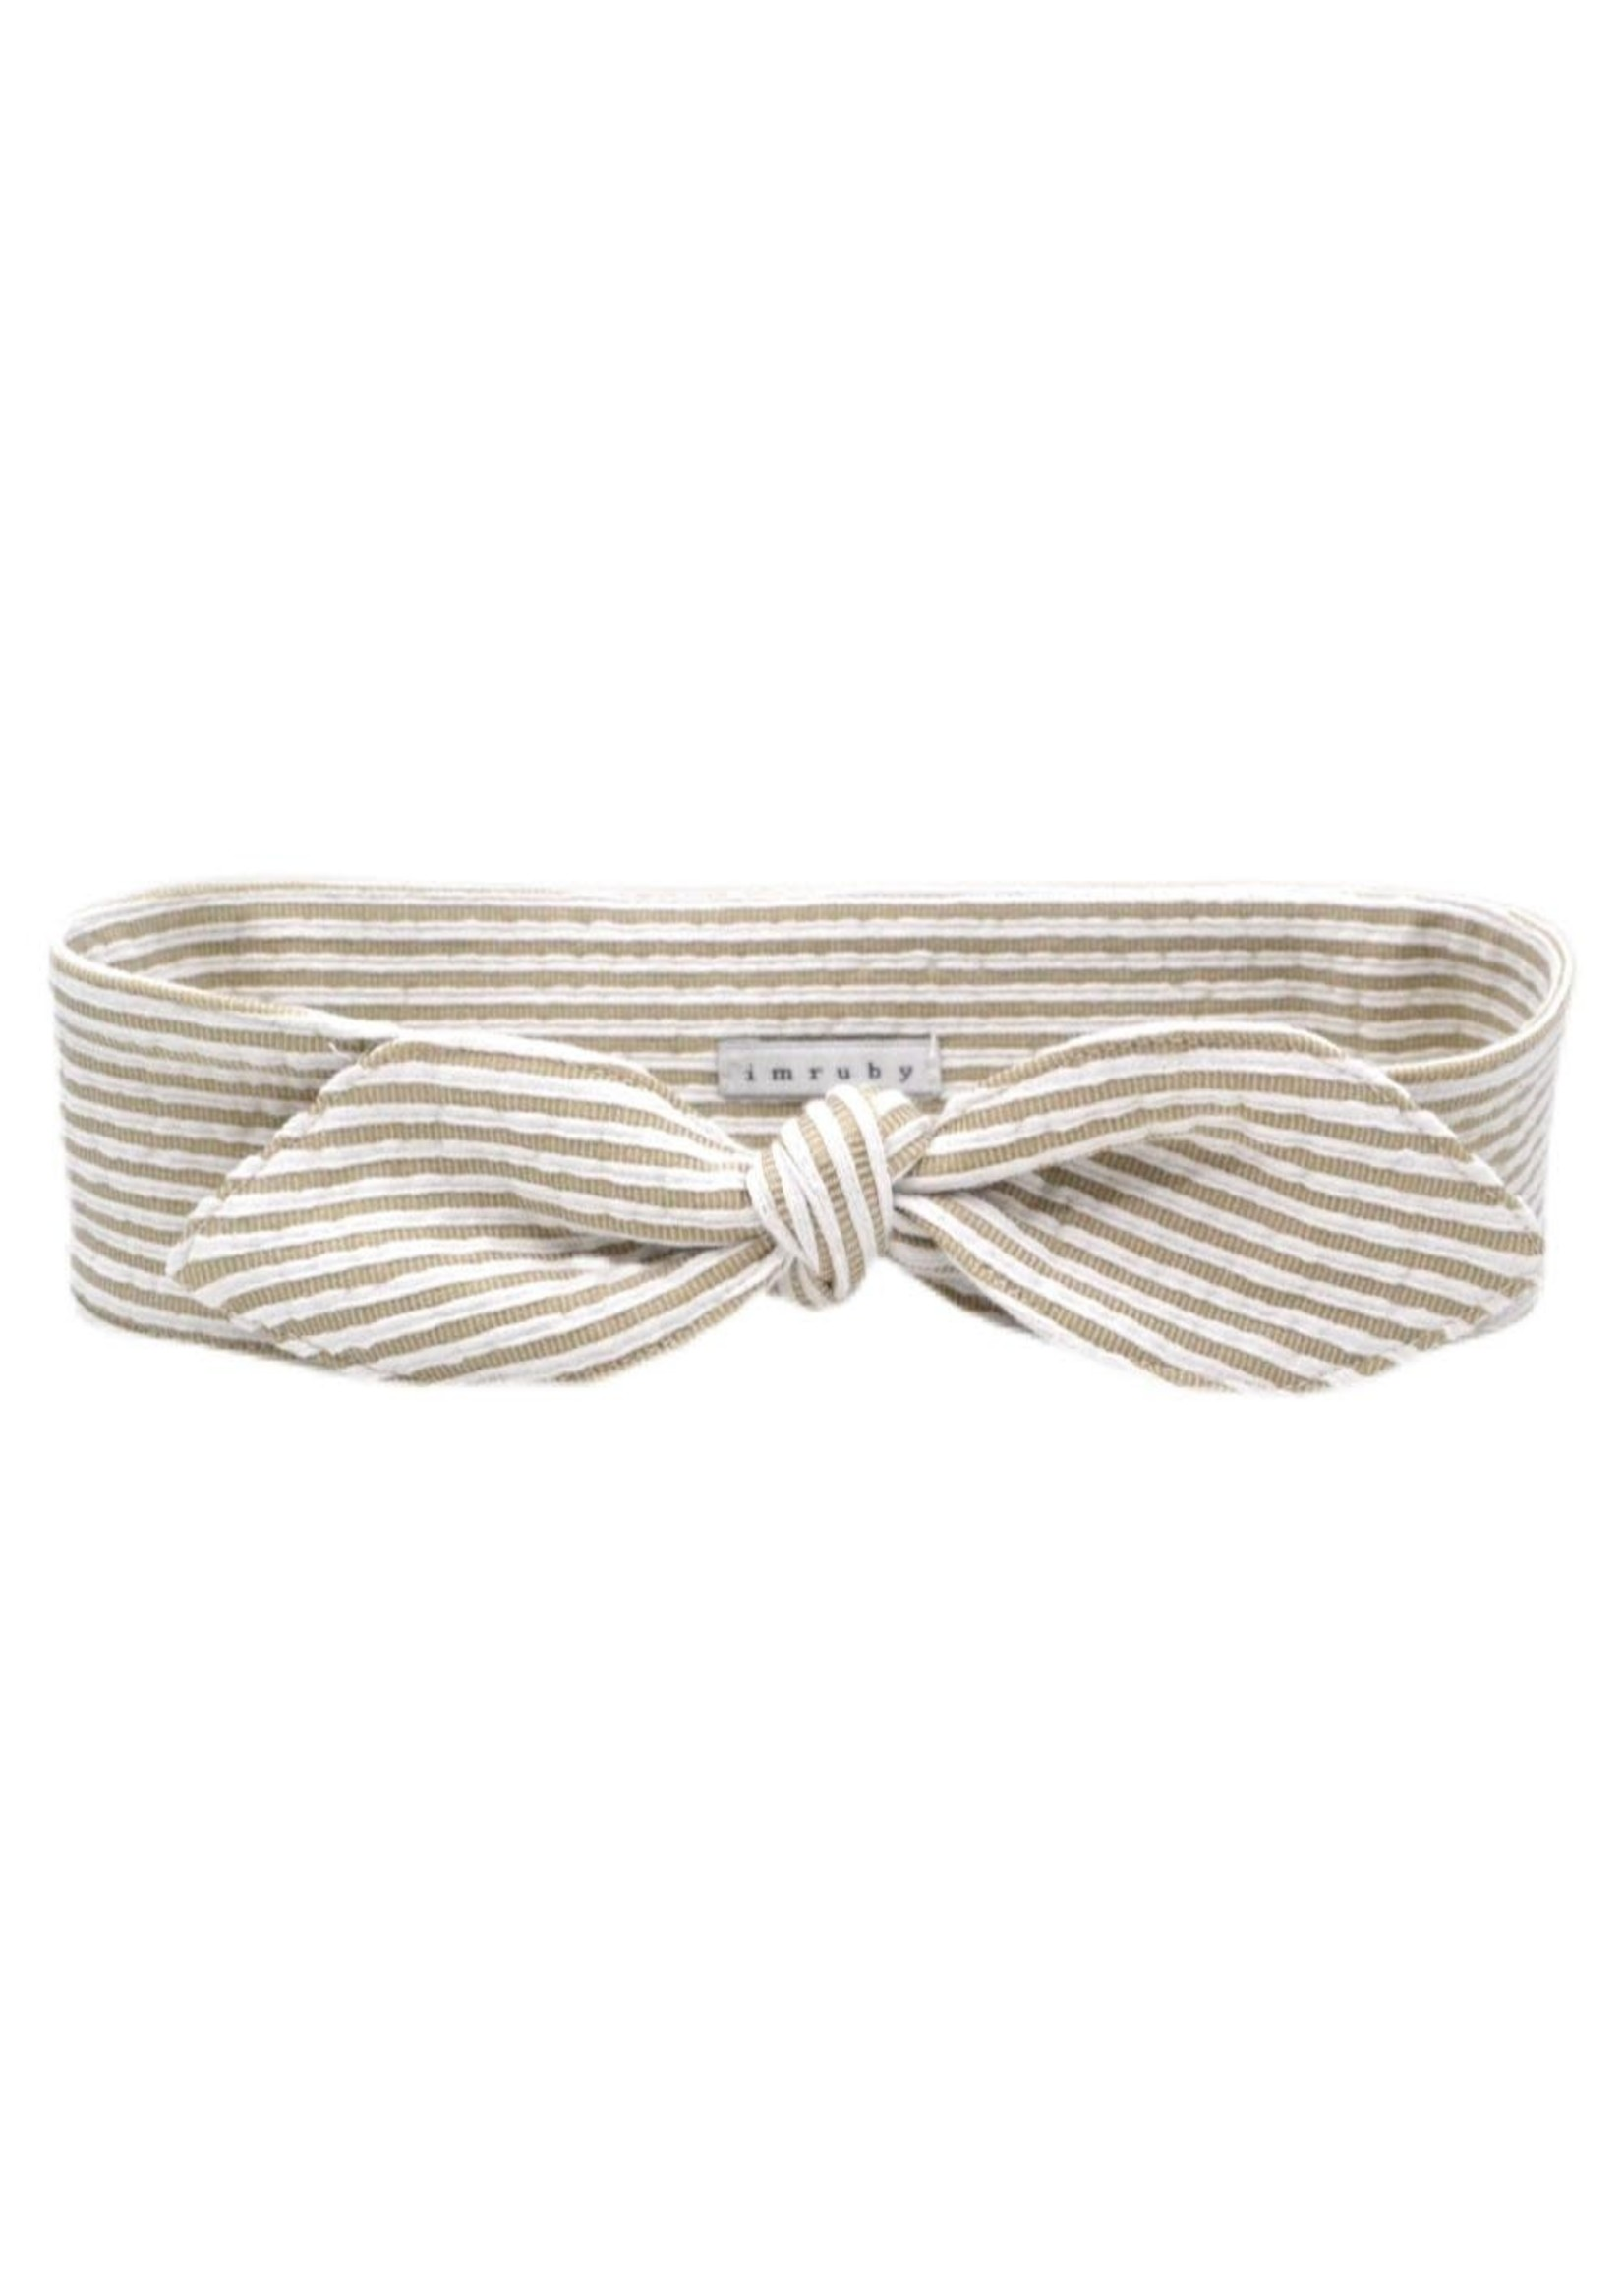 IMRUBY SIMONE Headband BABY